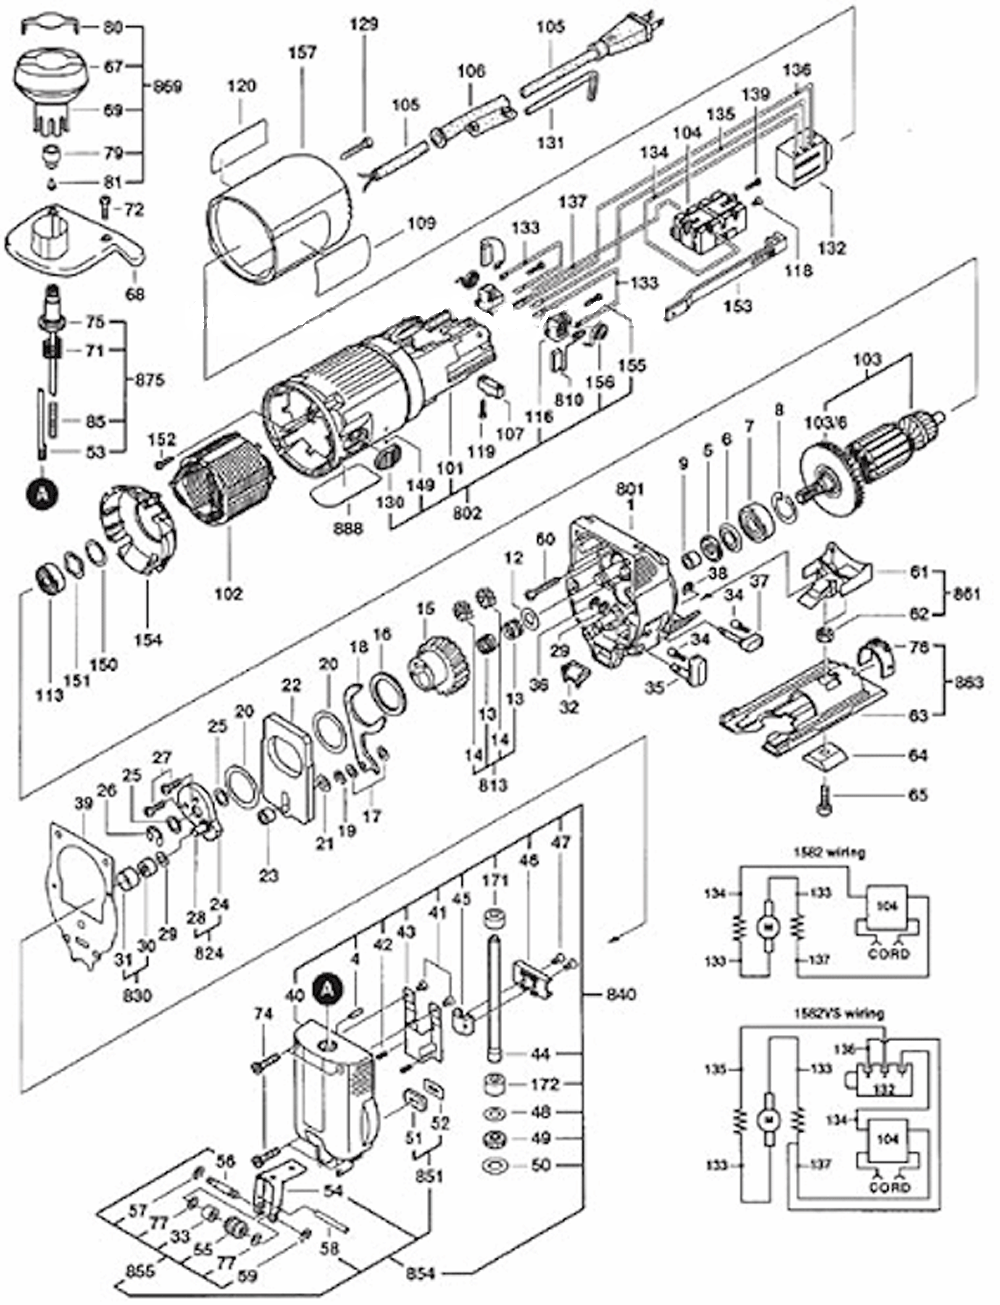 Bosch Parts Manual